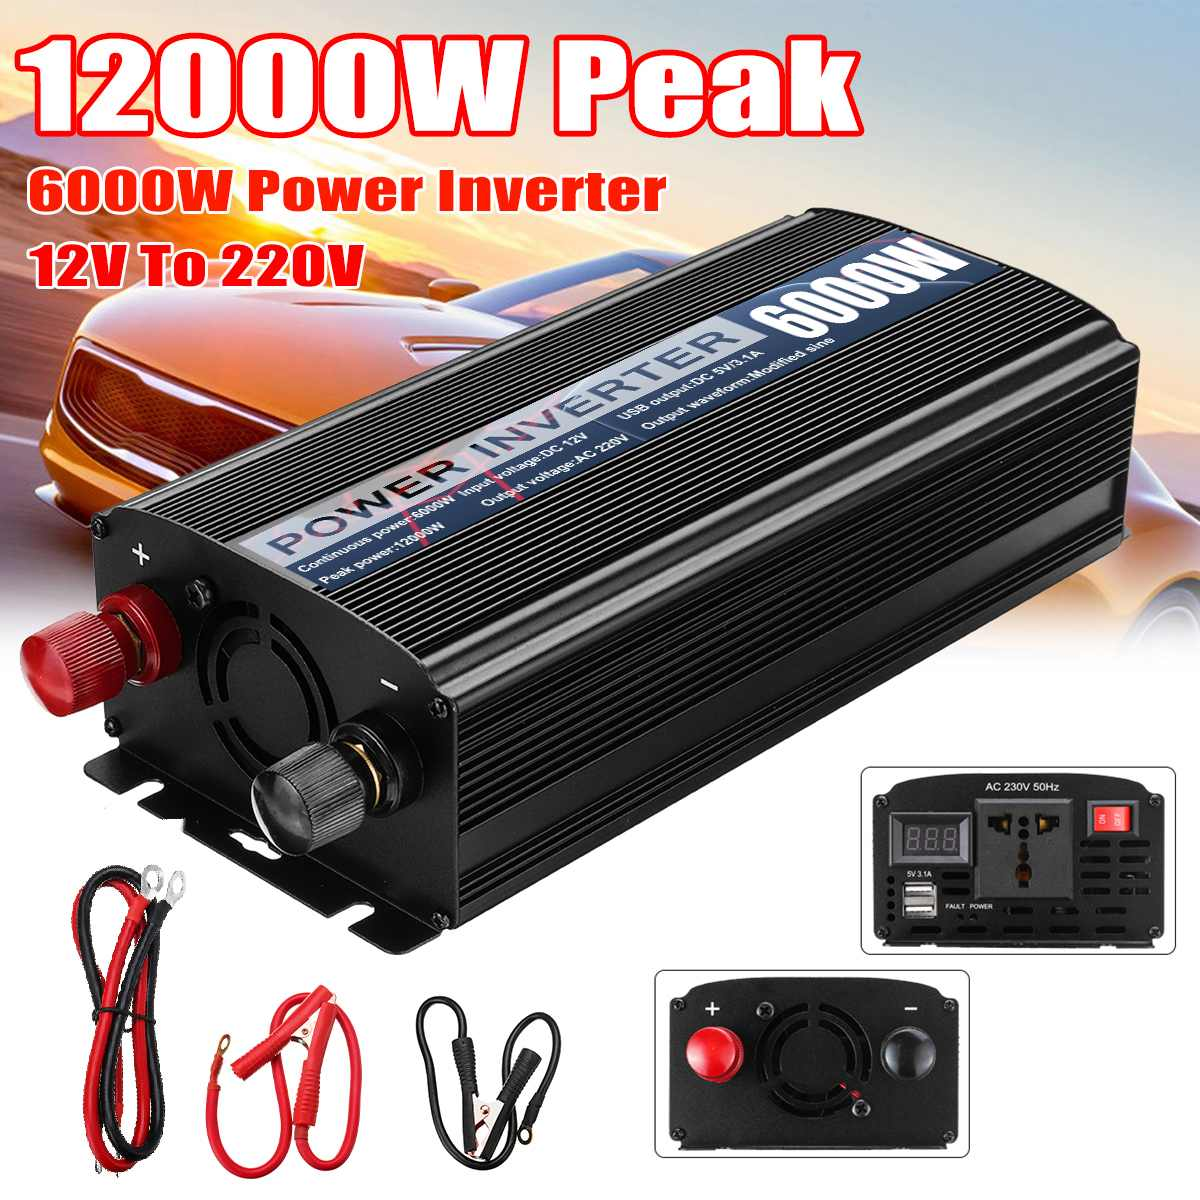 Inverter Max 12000W DC 12V zu AC 220V Dual USB Auto Power Inverter Ladegerät Converter Adapter Geändert sinus Welle Transformator